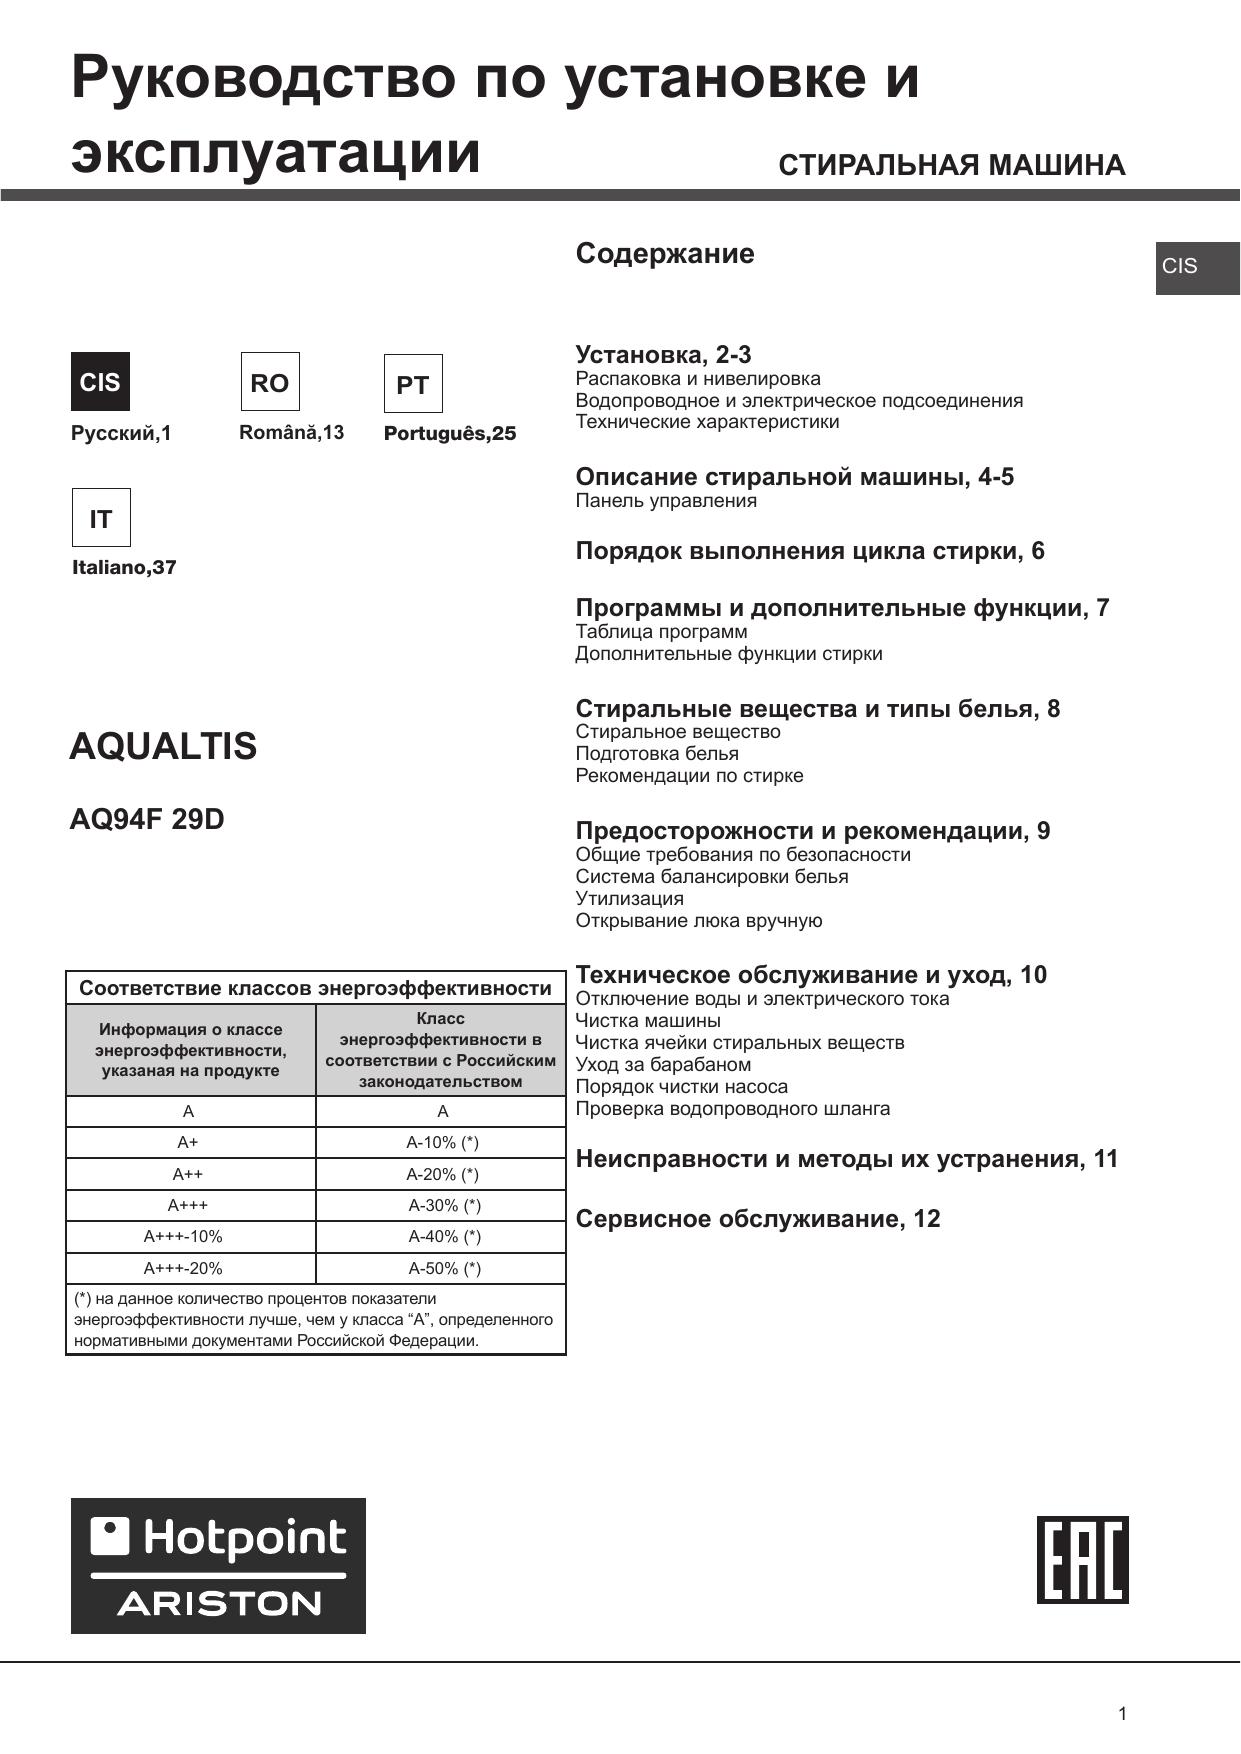 Indesit Aq94f 29d Eu Manuale Utente Manualzz Com